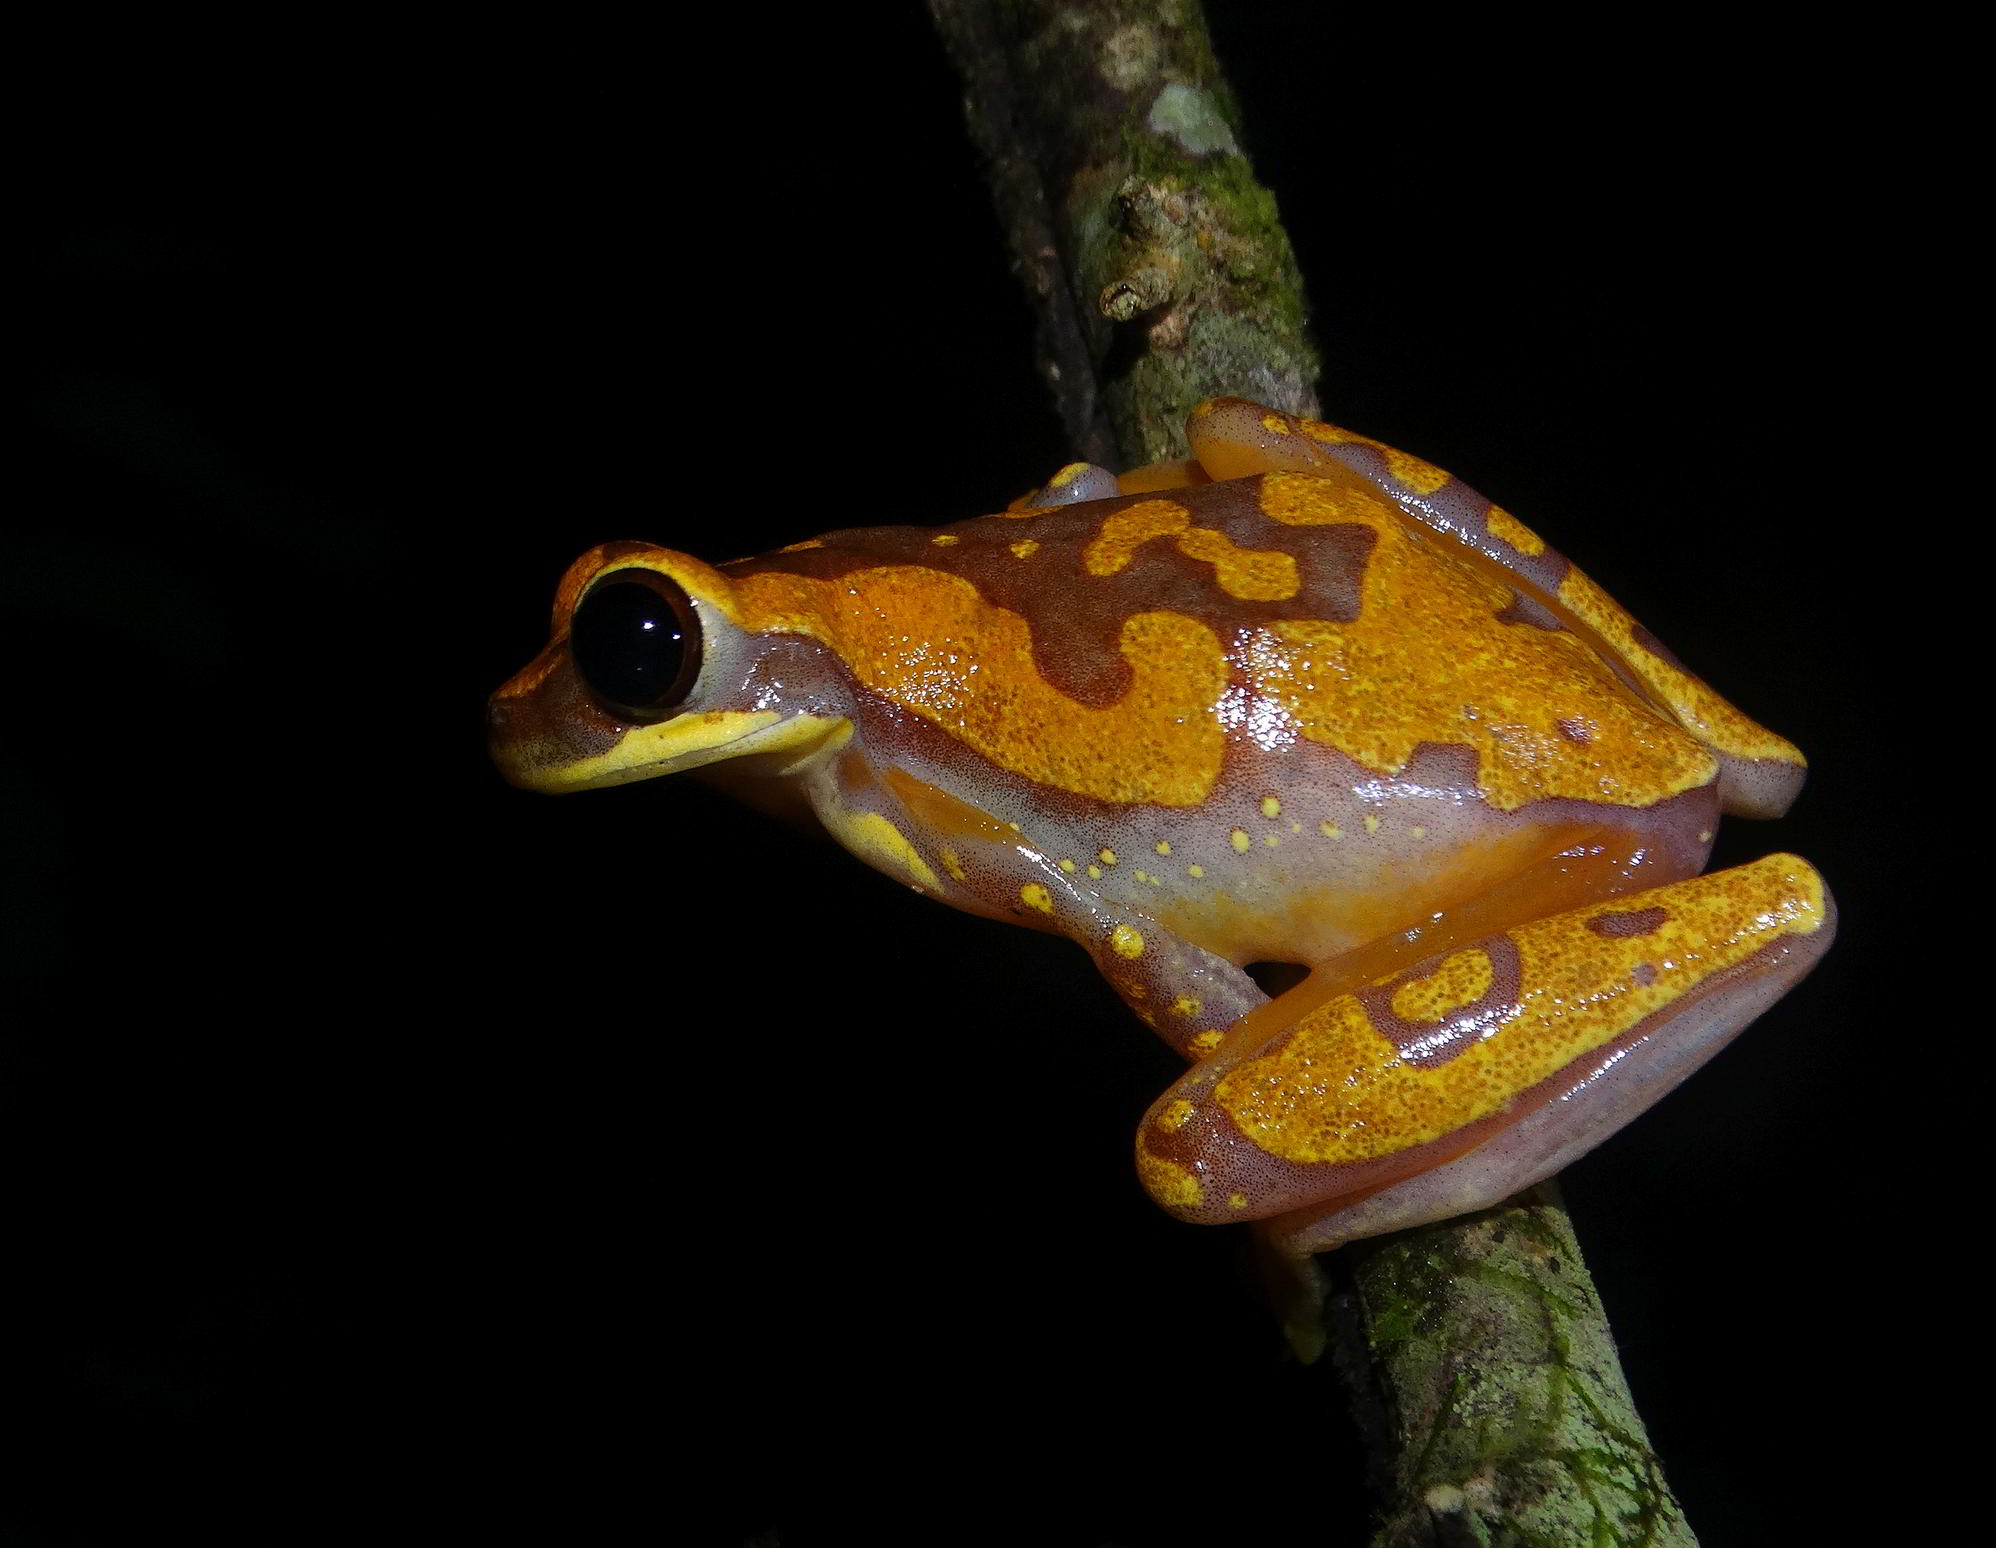 #nightlife #wildlife #caminatas #hiking #costaballenalovers #osa #wildlife #walks #costaricavacations #adventure(4)